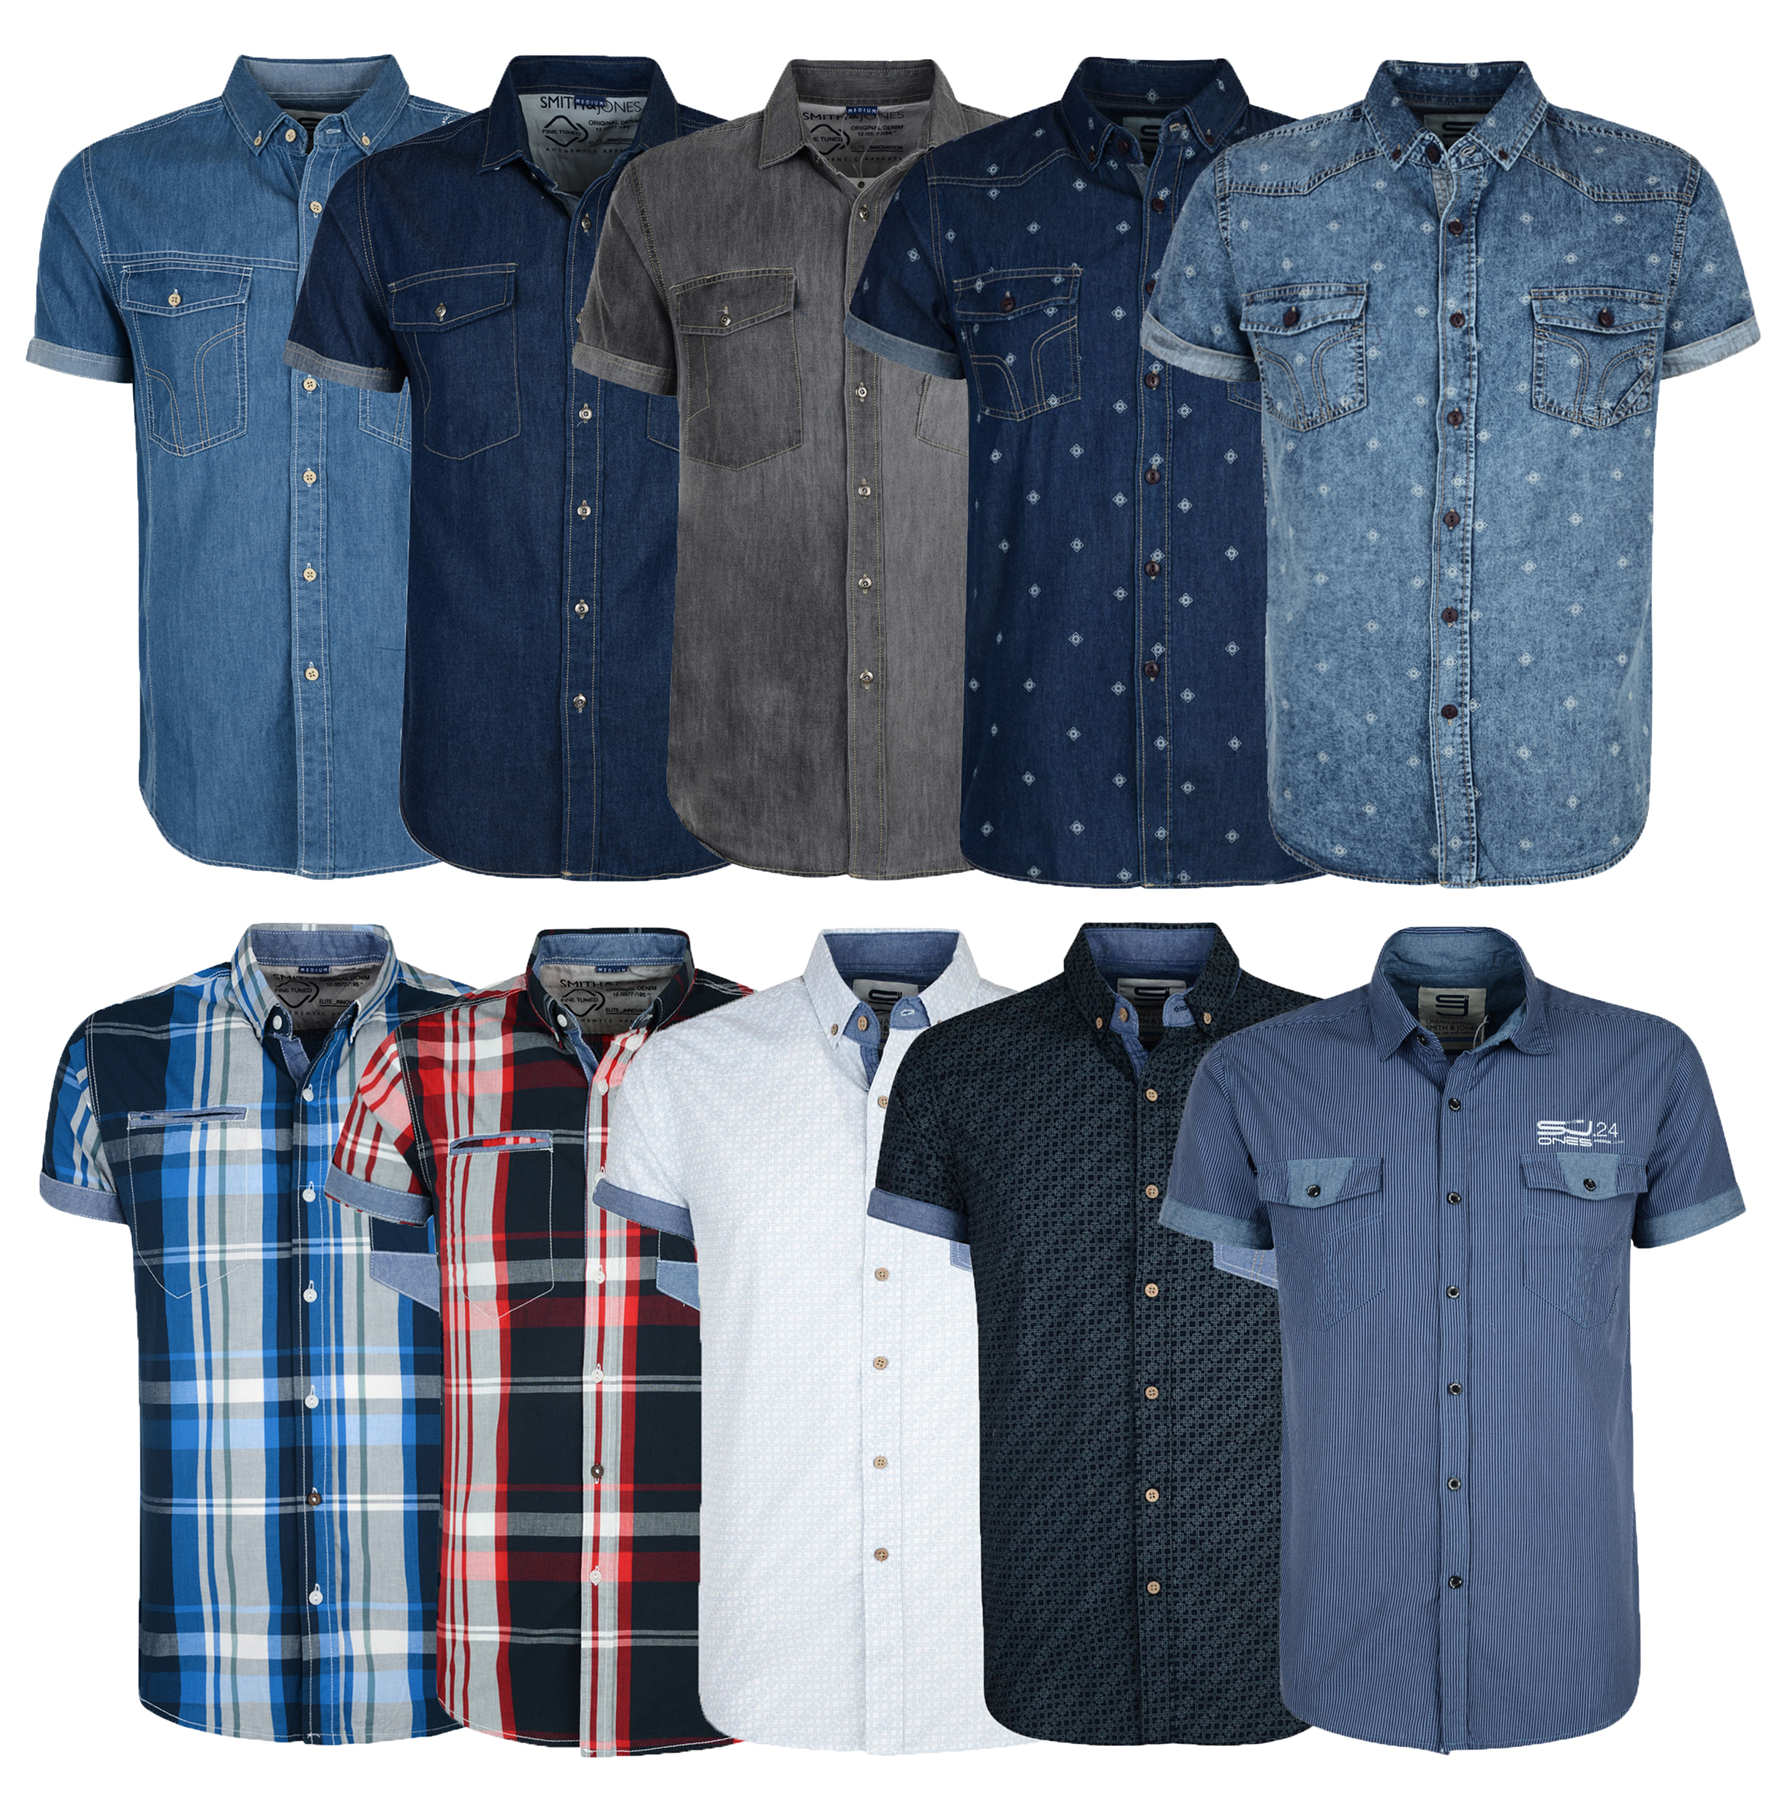 524f38d3cb2 Smith   Jones Men s New Short Sleeve Shirts Denim Check Stripe ...